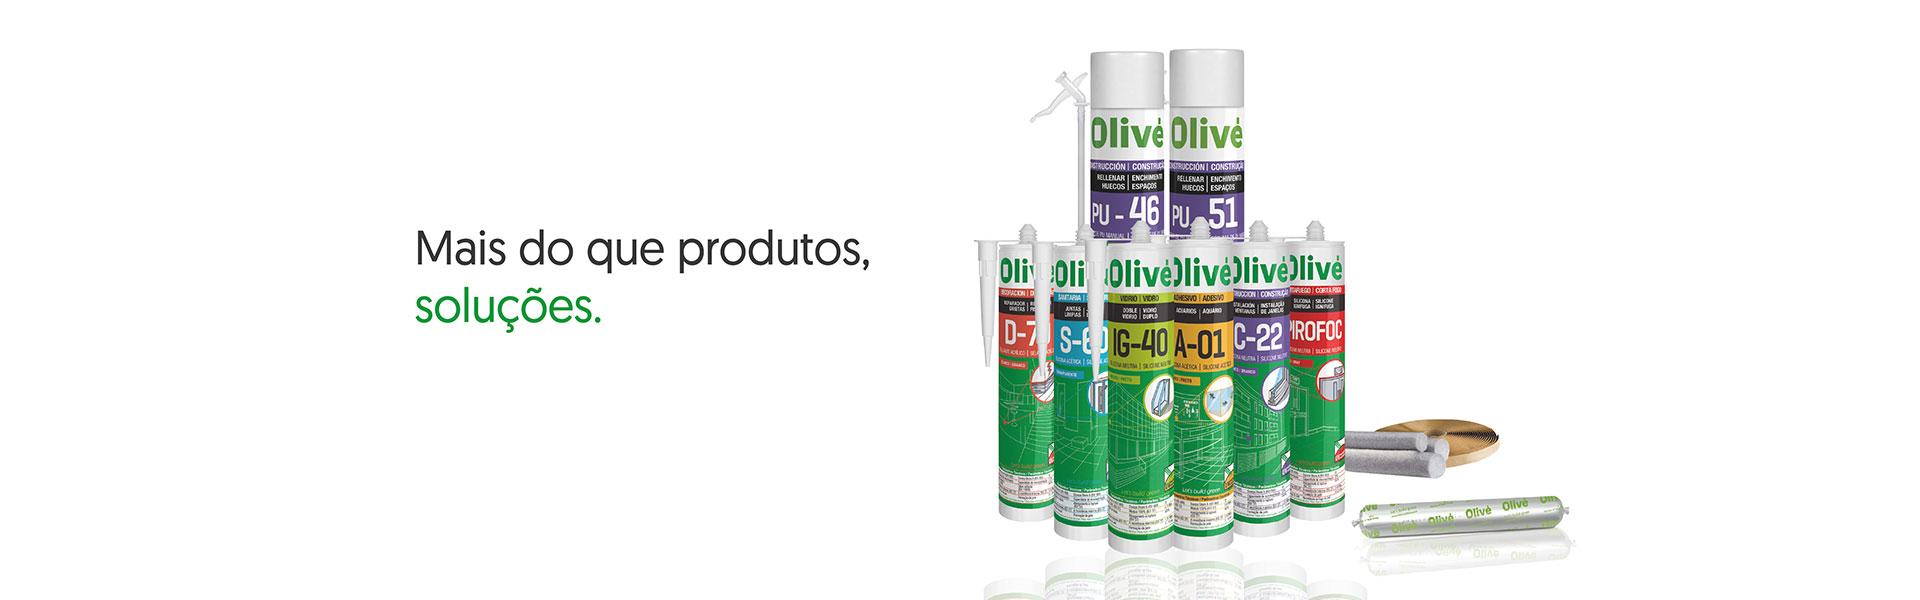 olive-solucoes